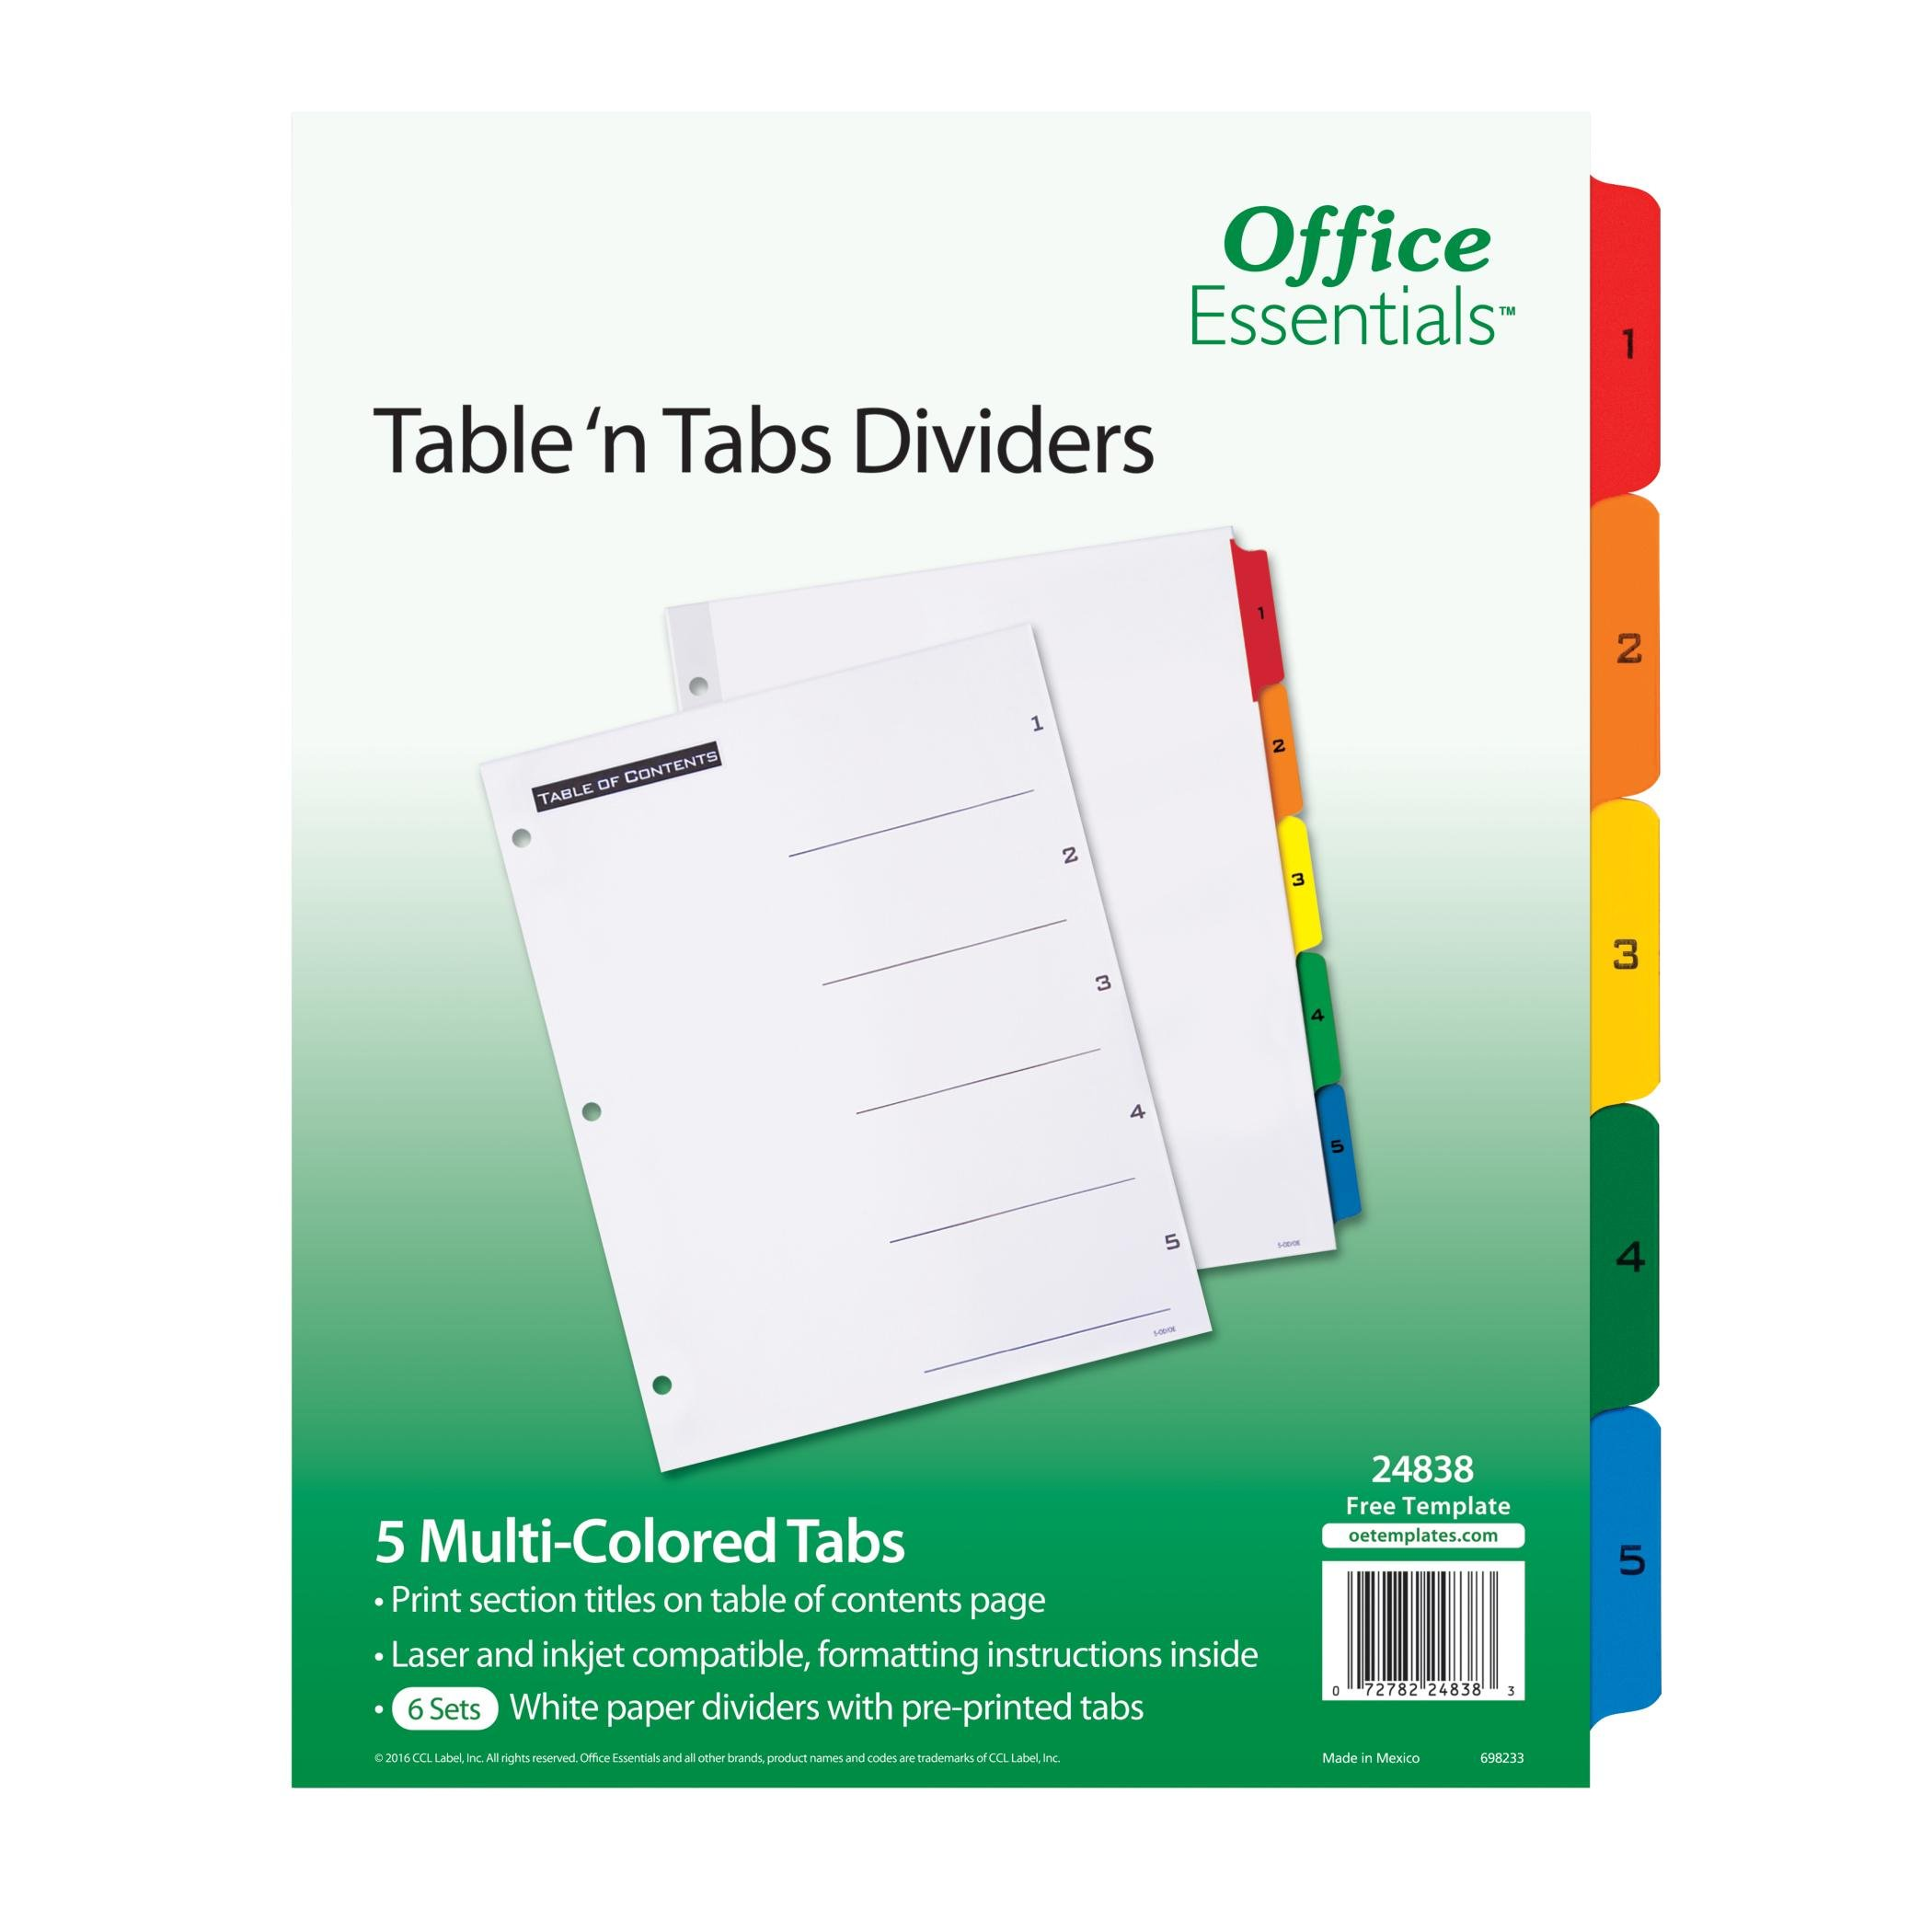 Office Essentials Table 'N Tabs Dividers, 8-1/2'' x 11'', 1-5 Multicolor Tab, Laser/Inkjet, 6 Pack, (24838)